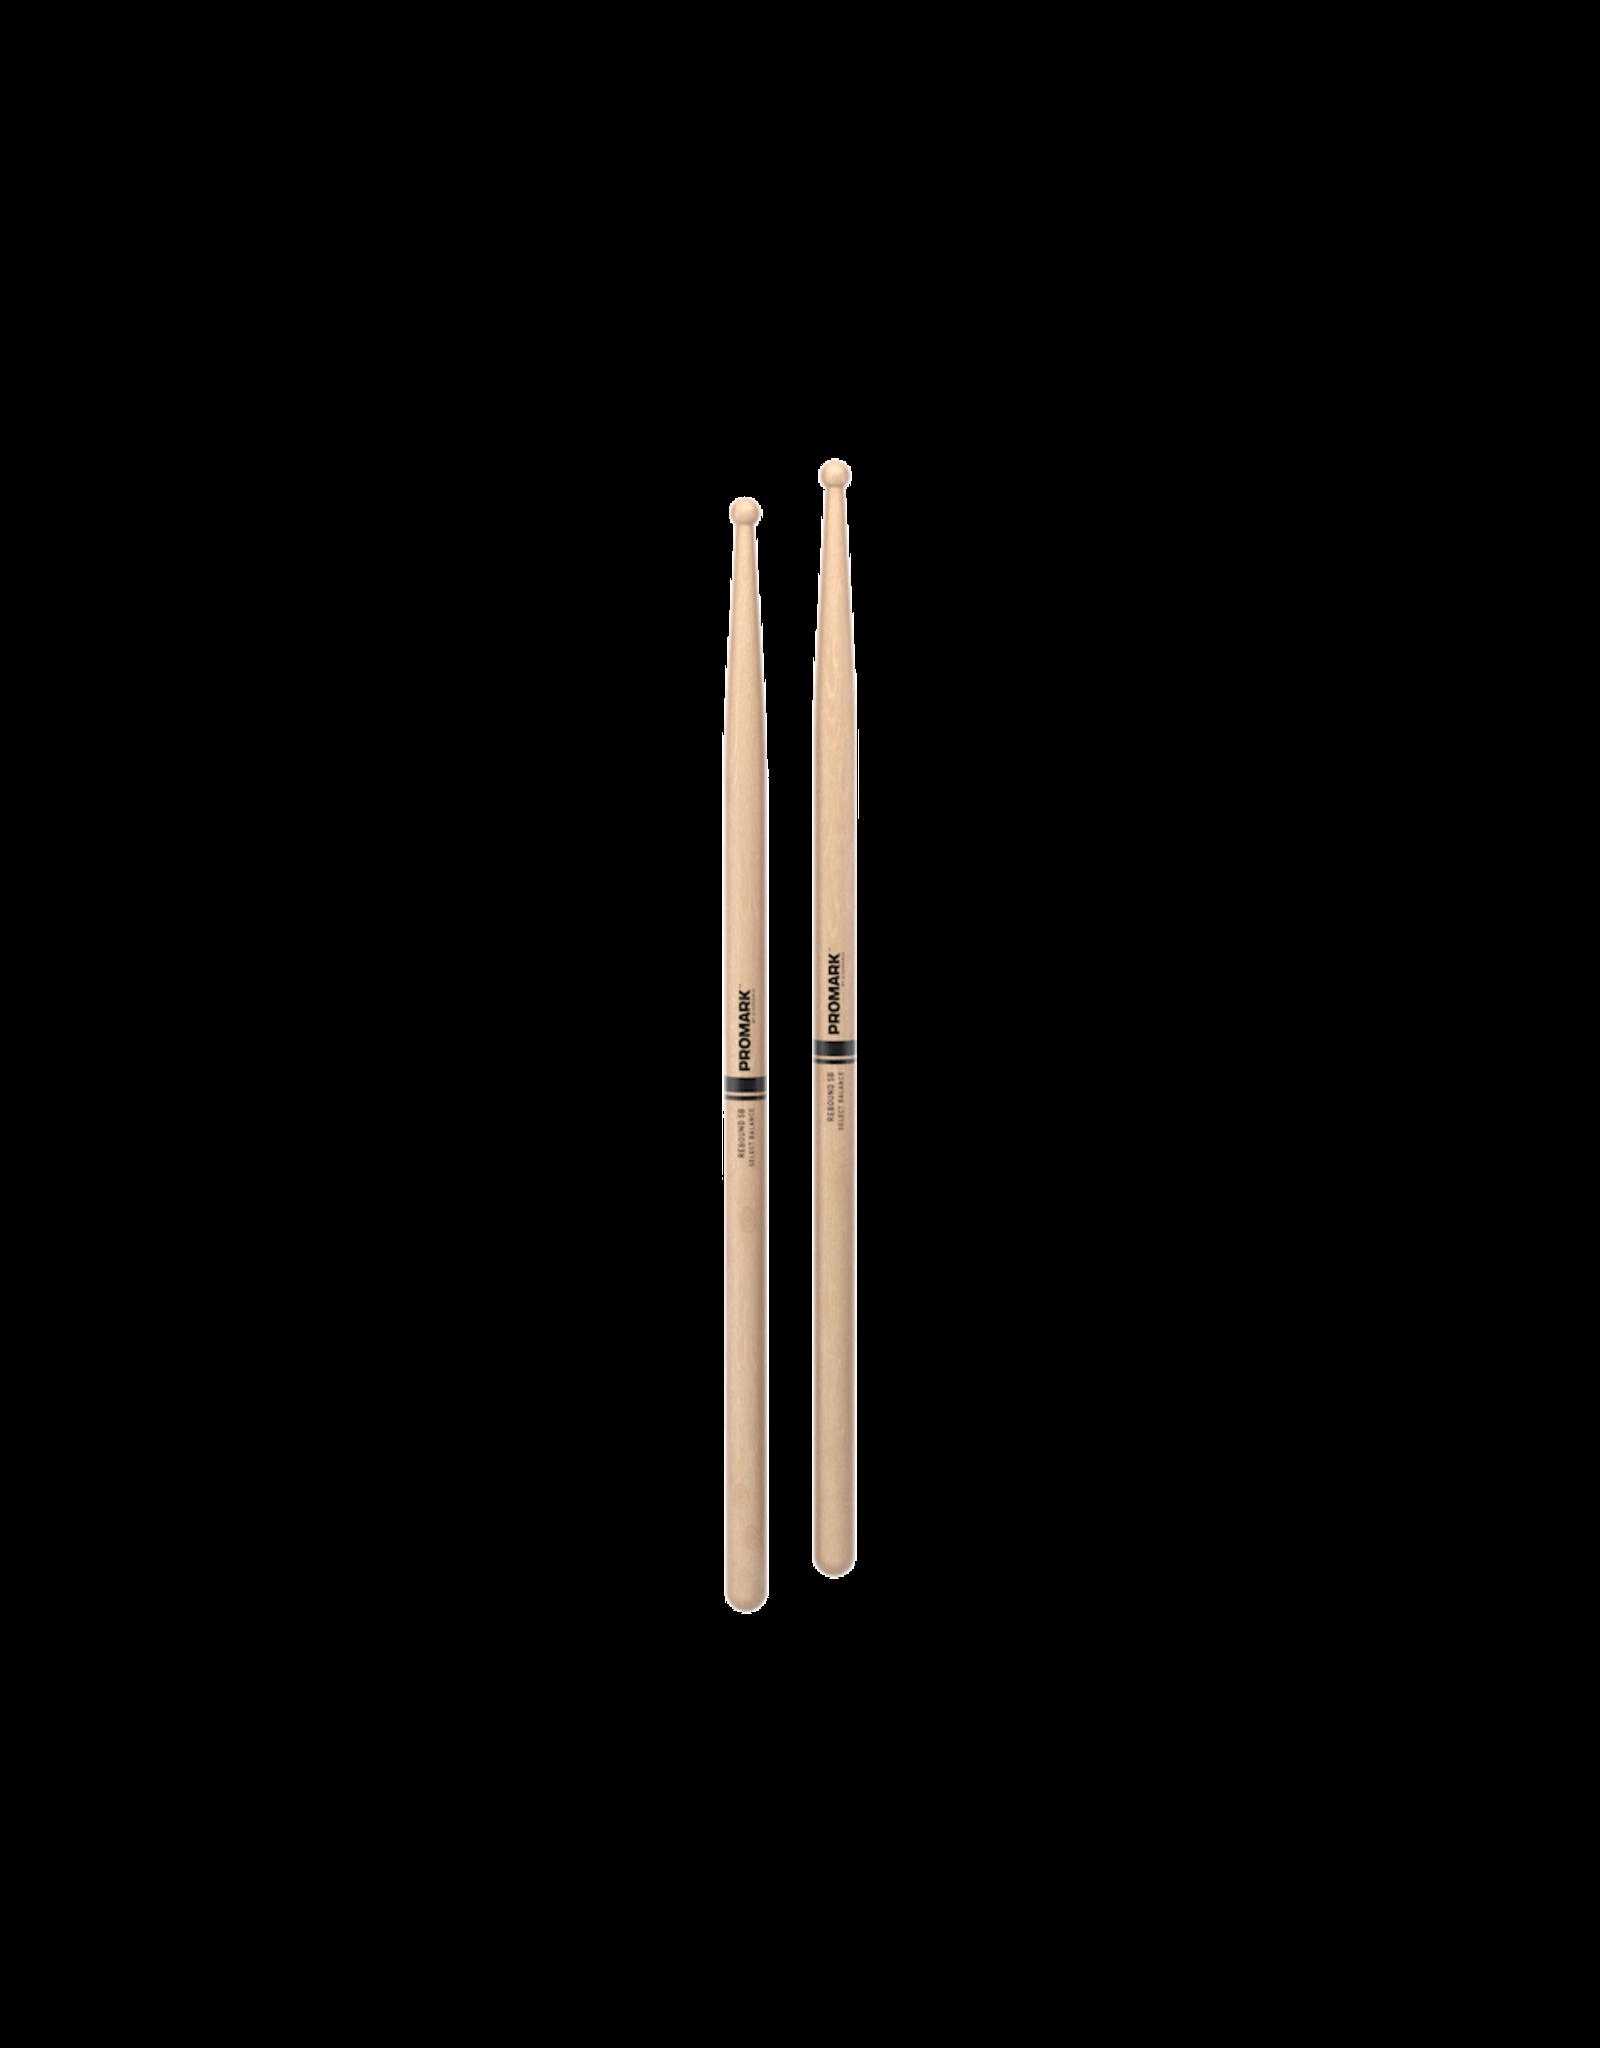 Promark Promark REBOUND 5B Maple Wood Tip Drumstick